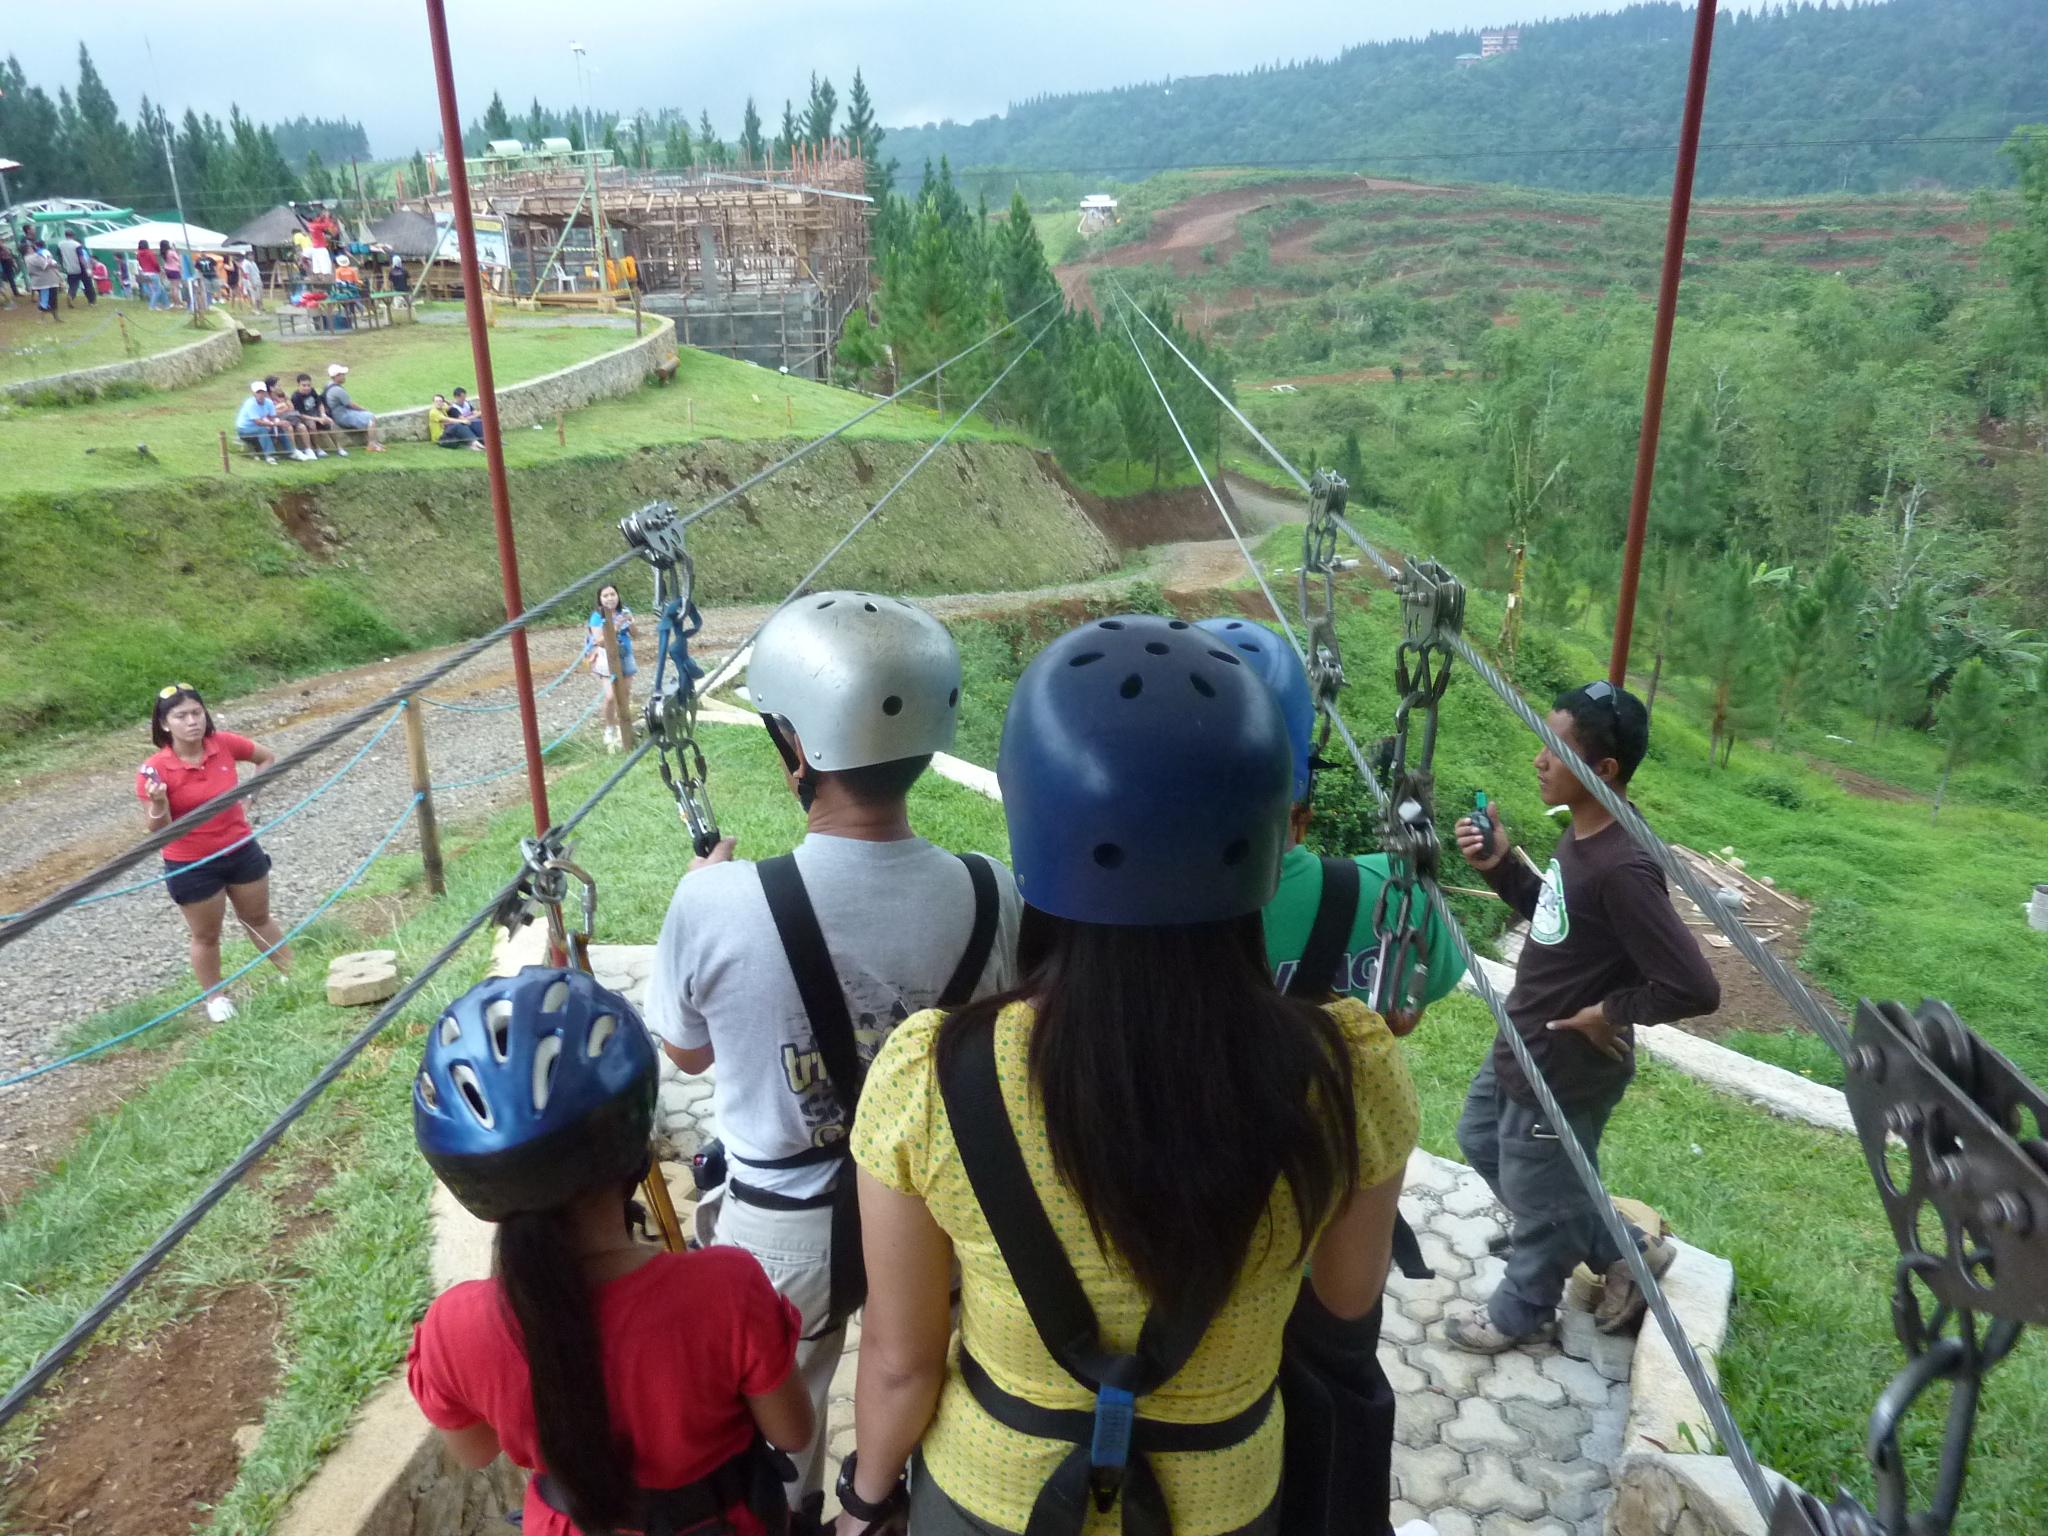 Compostela Valley Mindanao to have 1.5 km zipline